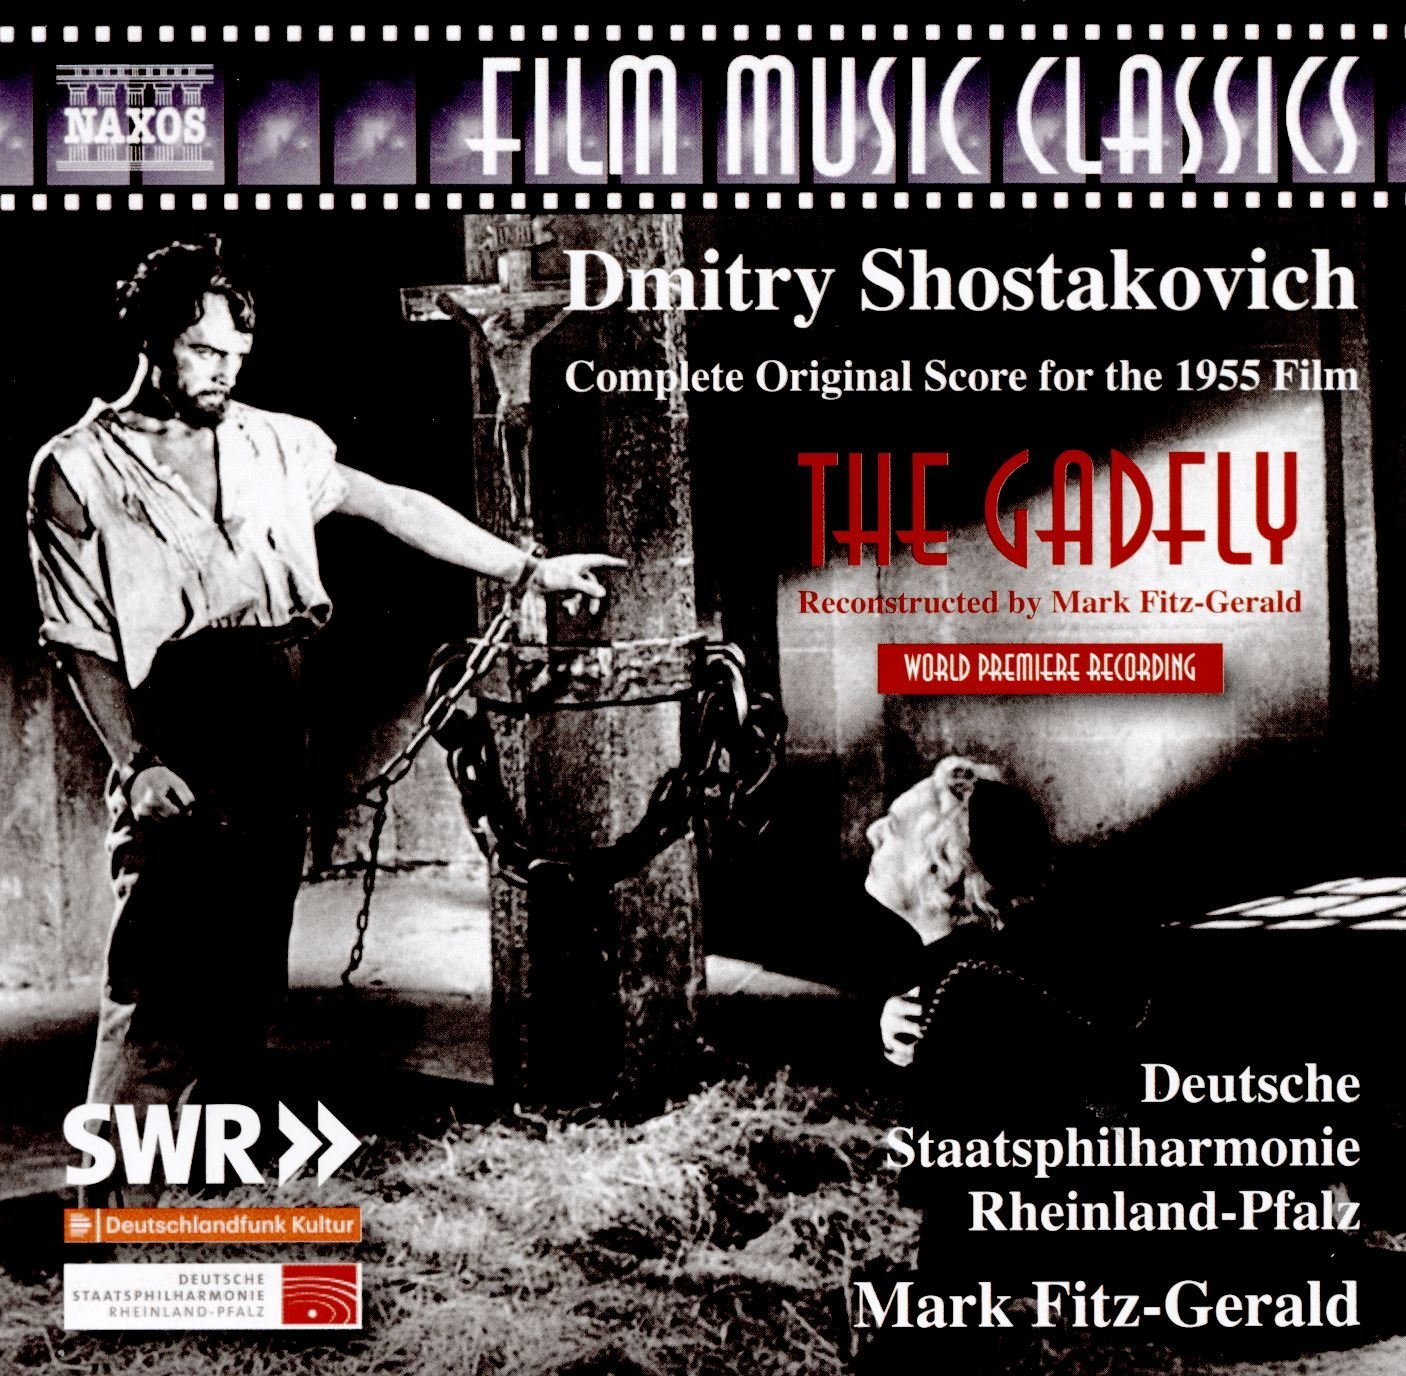 Shostakovich: The Gadfly (Complete original score